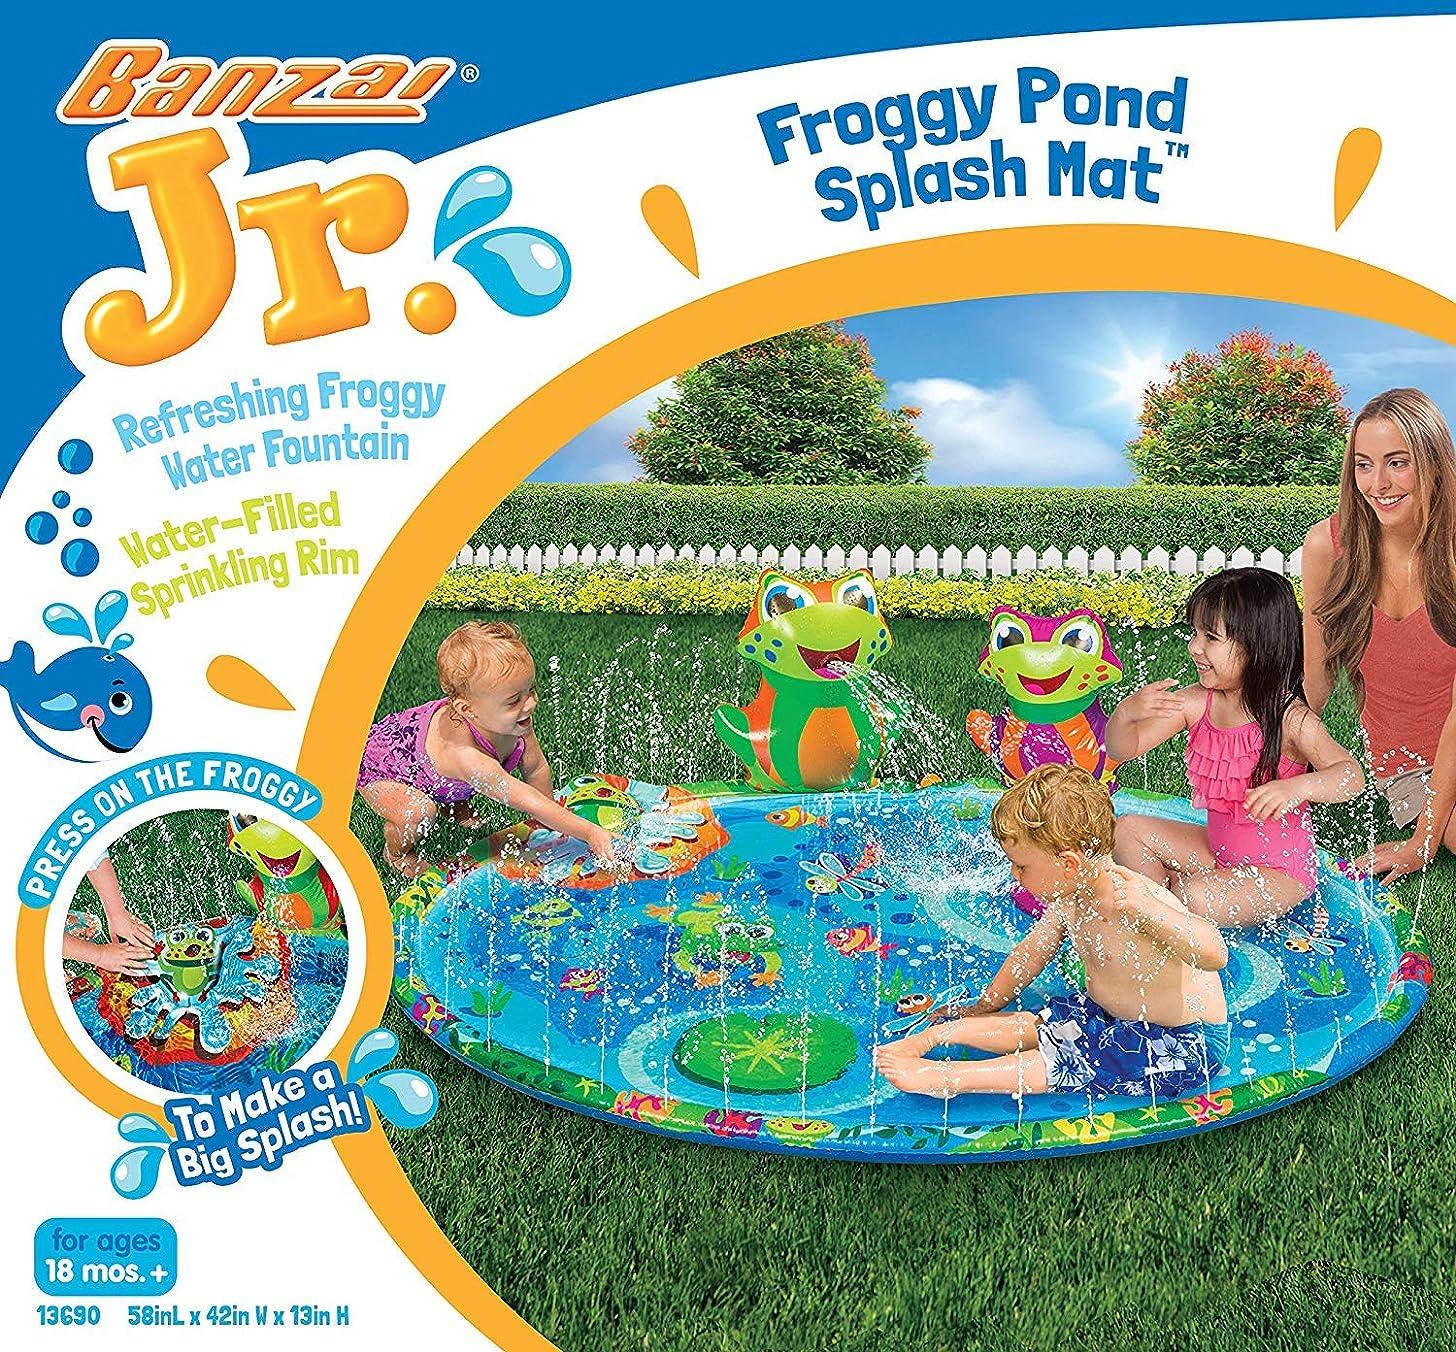 BANZAI 13690 Froggy Pond Splash Mat